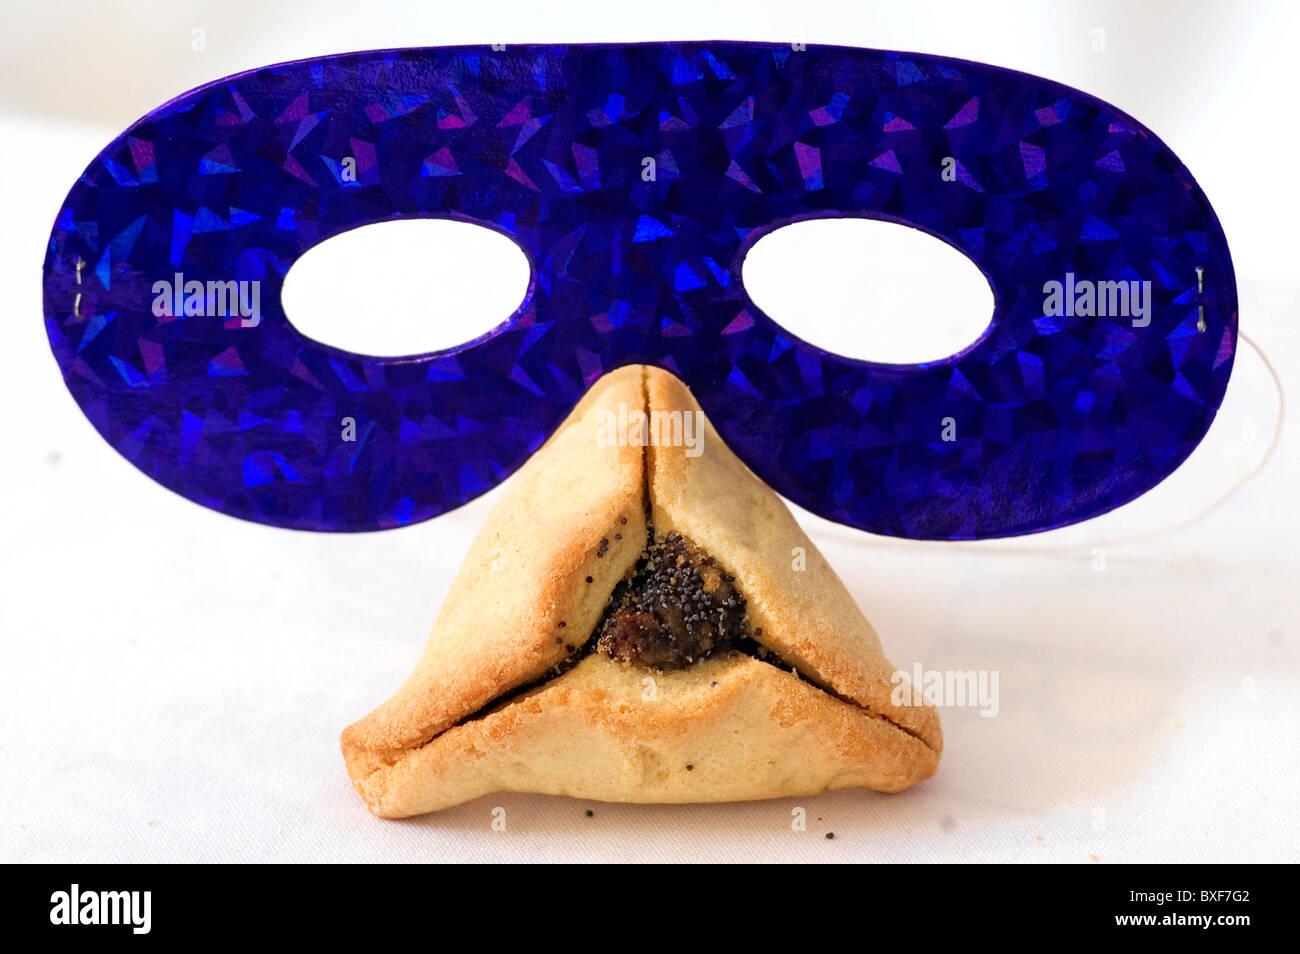 Studio Photo of blue mask and hamantash pastry traditionally eaten on the Jewish holiday of Purim isolated on white - Stock Image